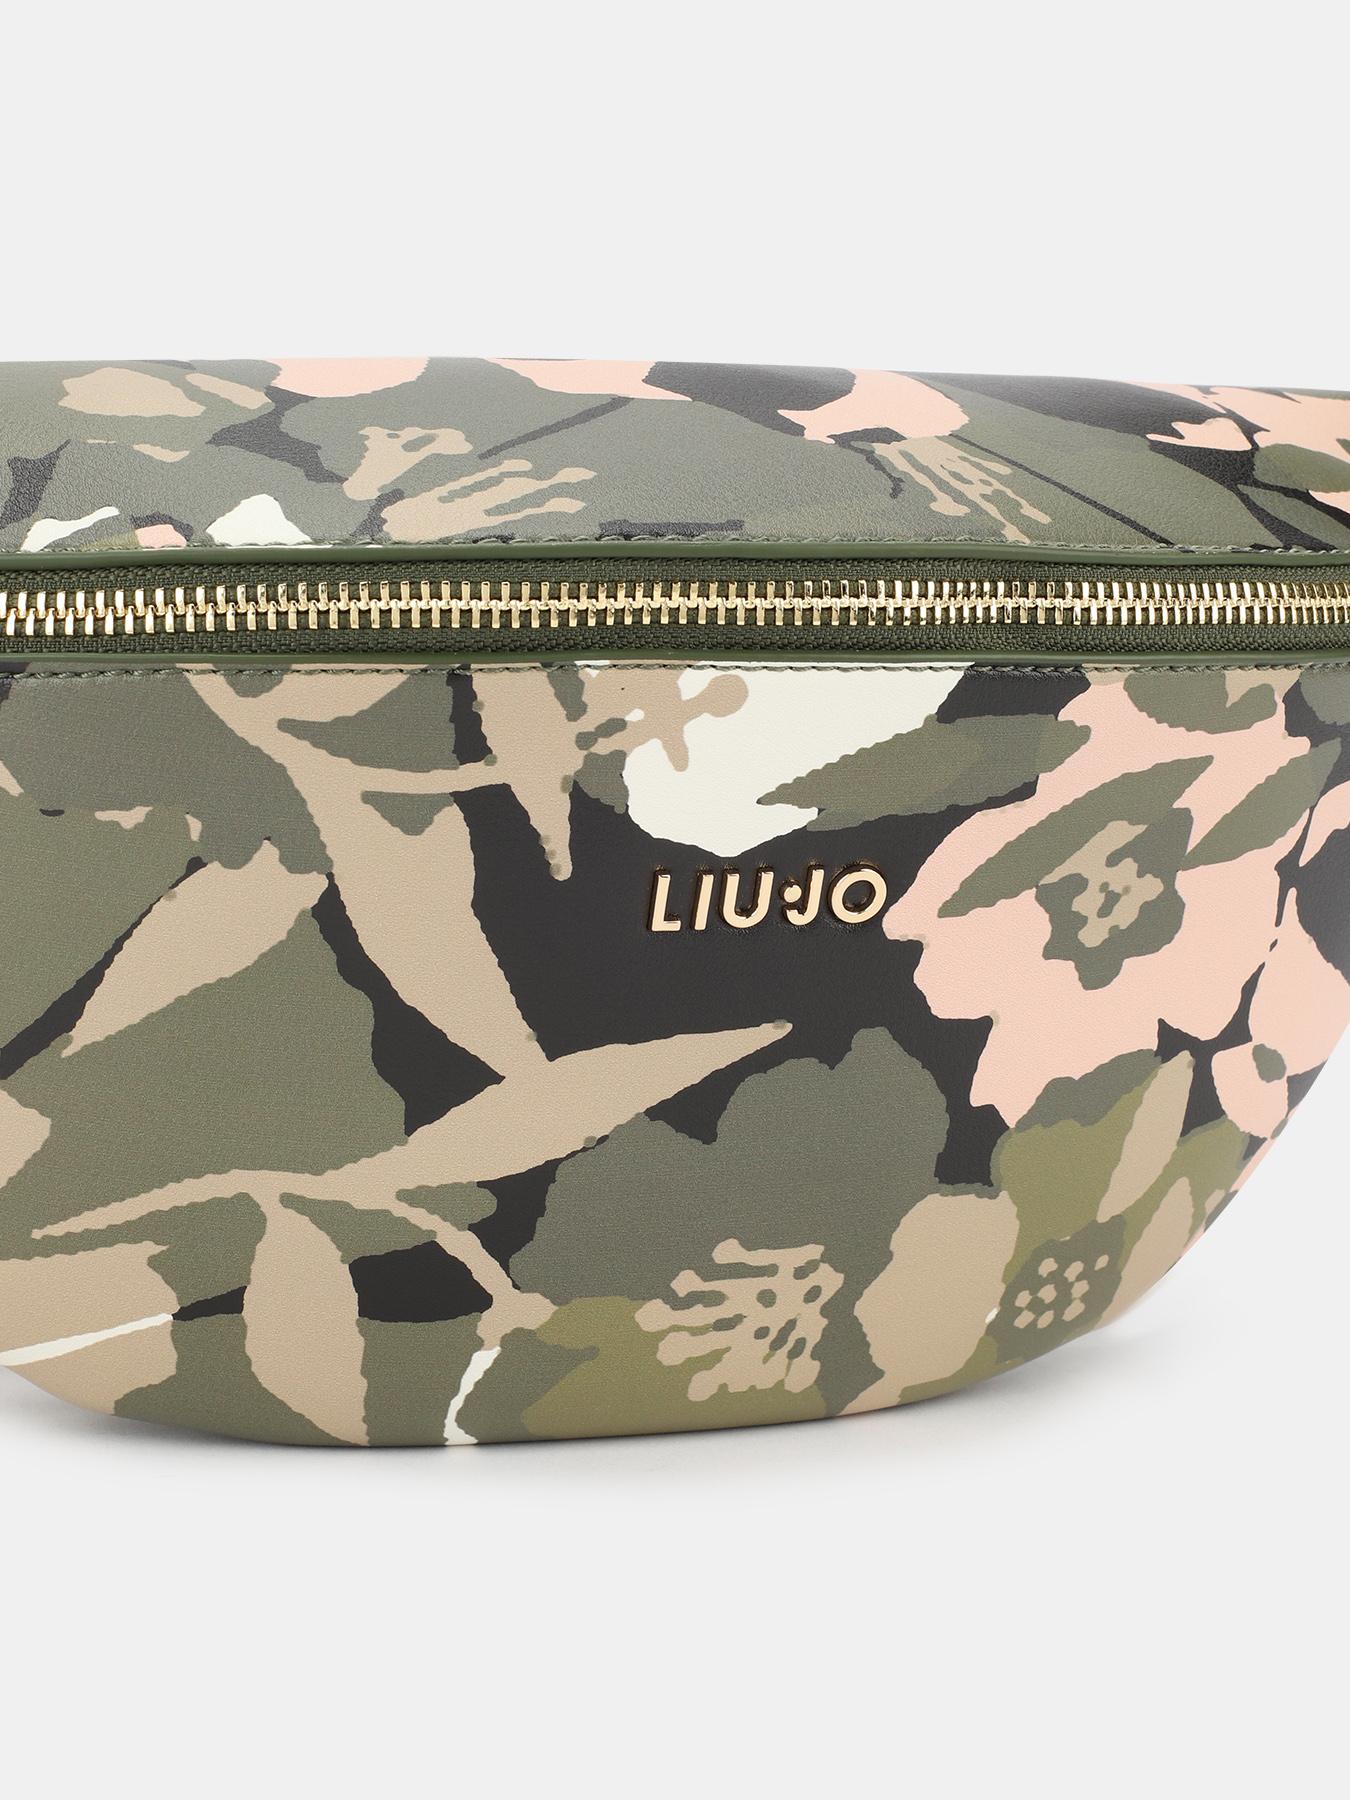 Liu Jo Женская сумка 360908-185 Фото 4